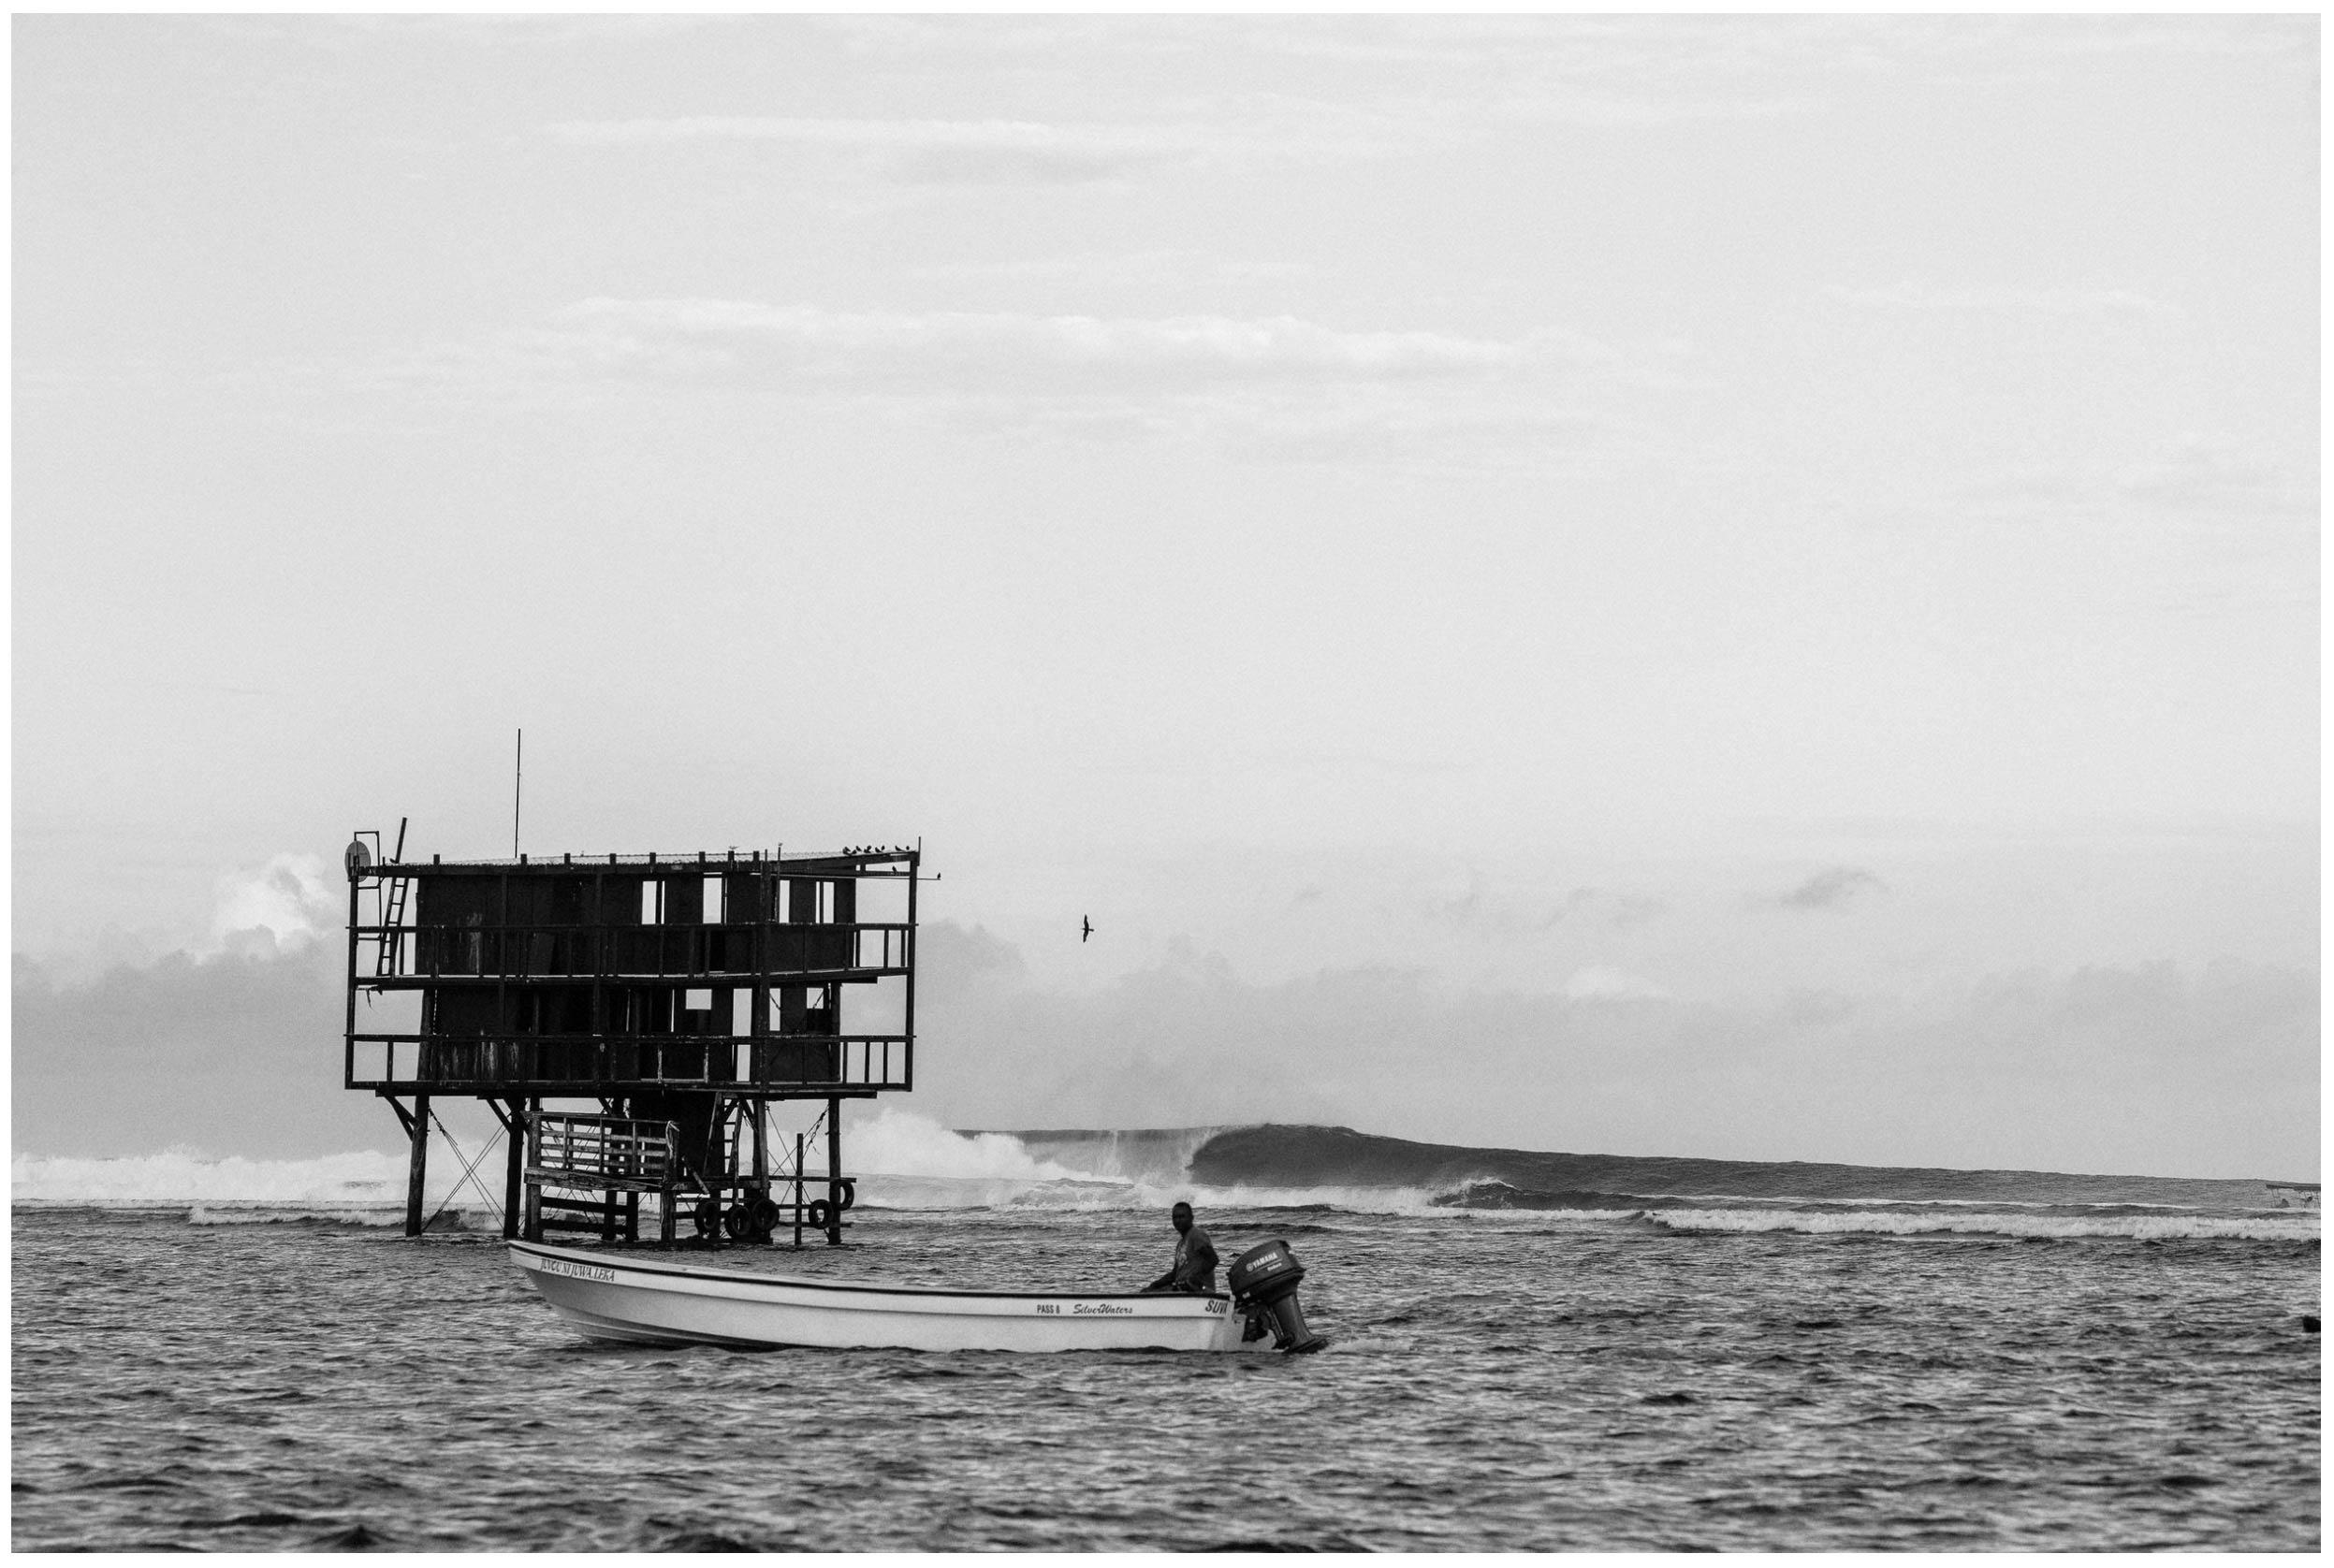 rodd-owen-ocean-surf-photography-for-sale-126.jpg